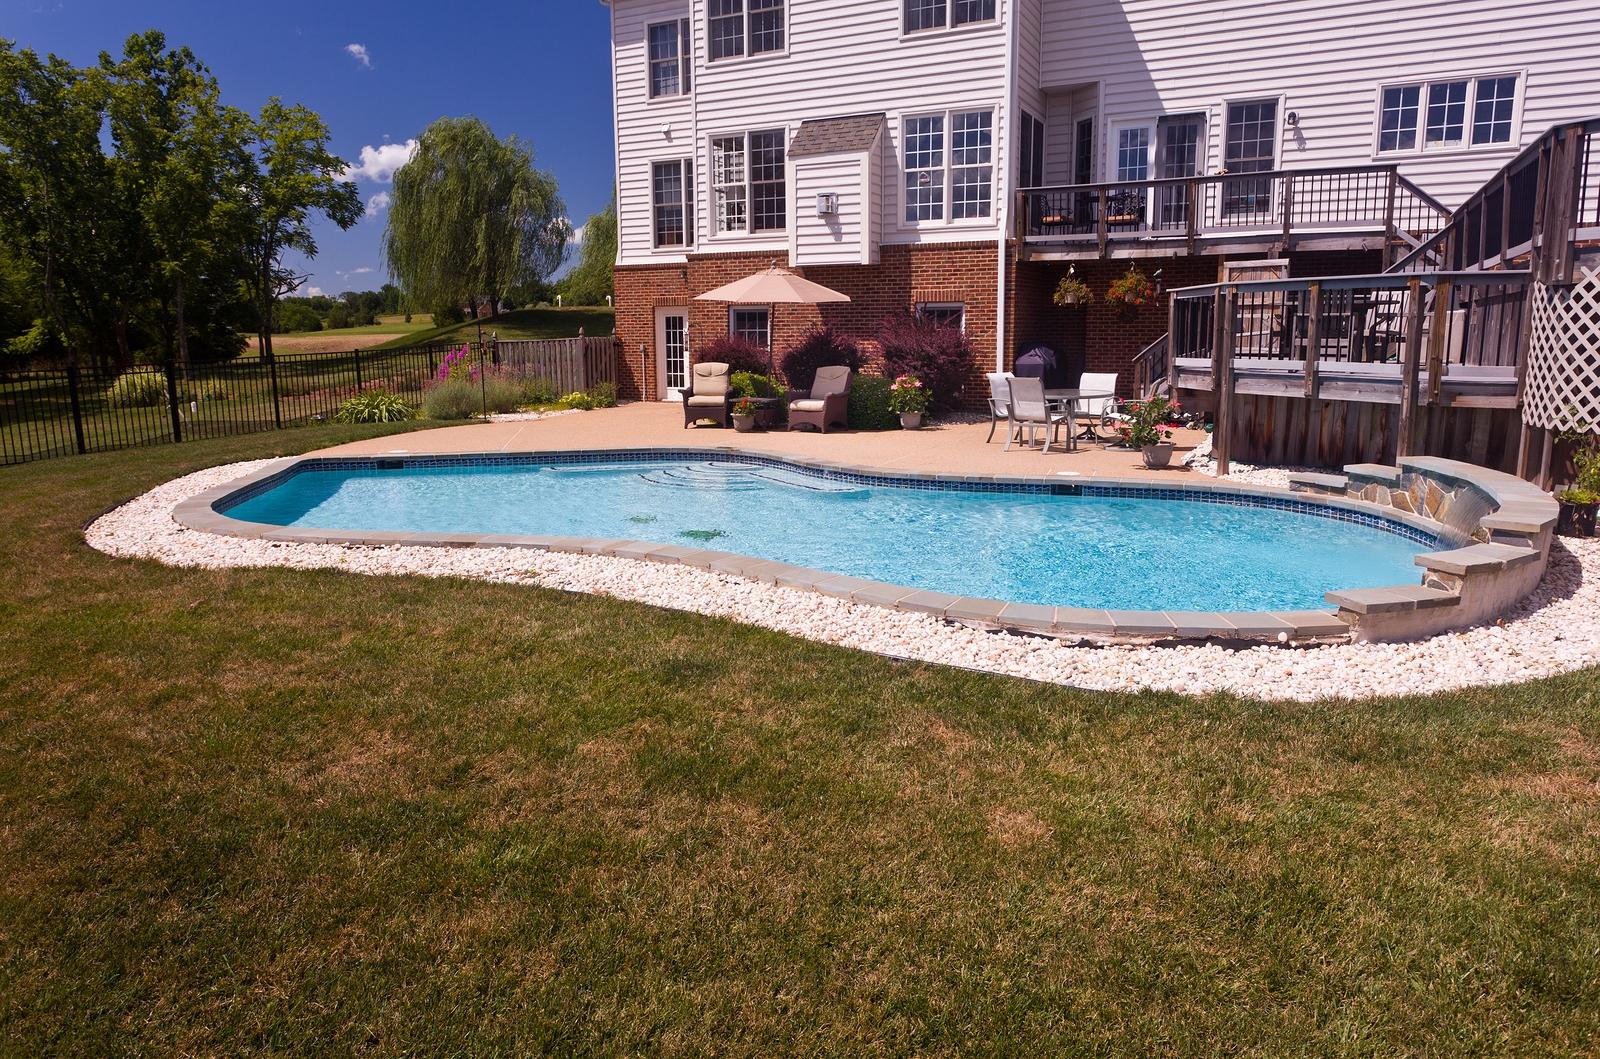 bigstock-backyard-swimming-pool-and-pat-21791915